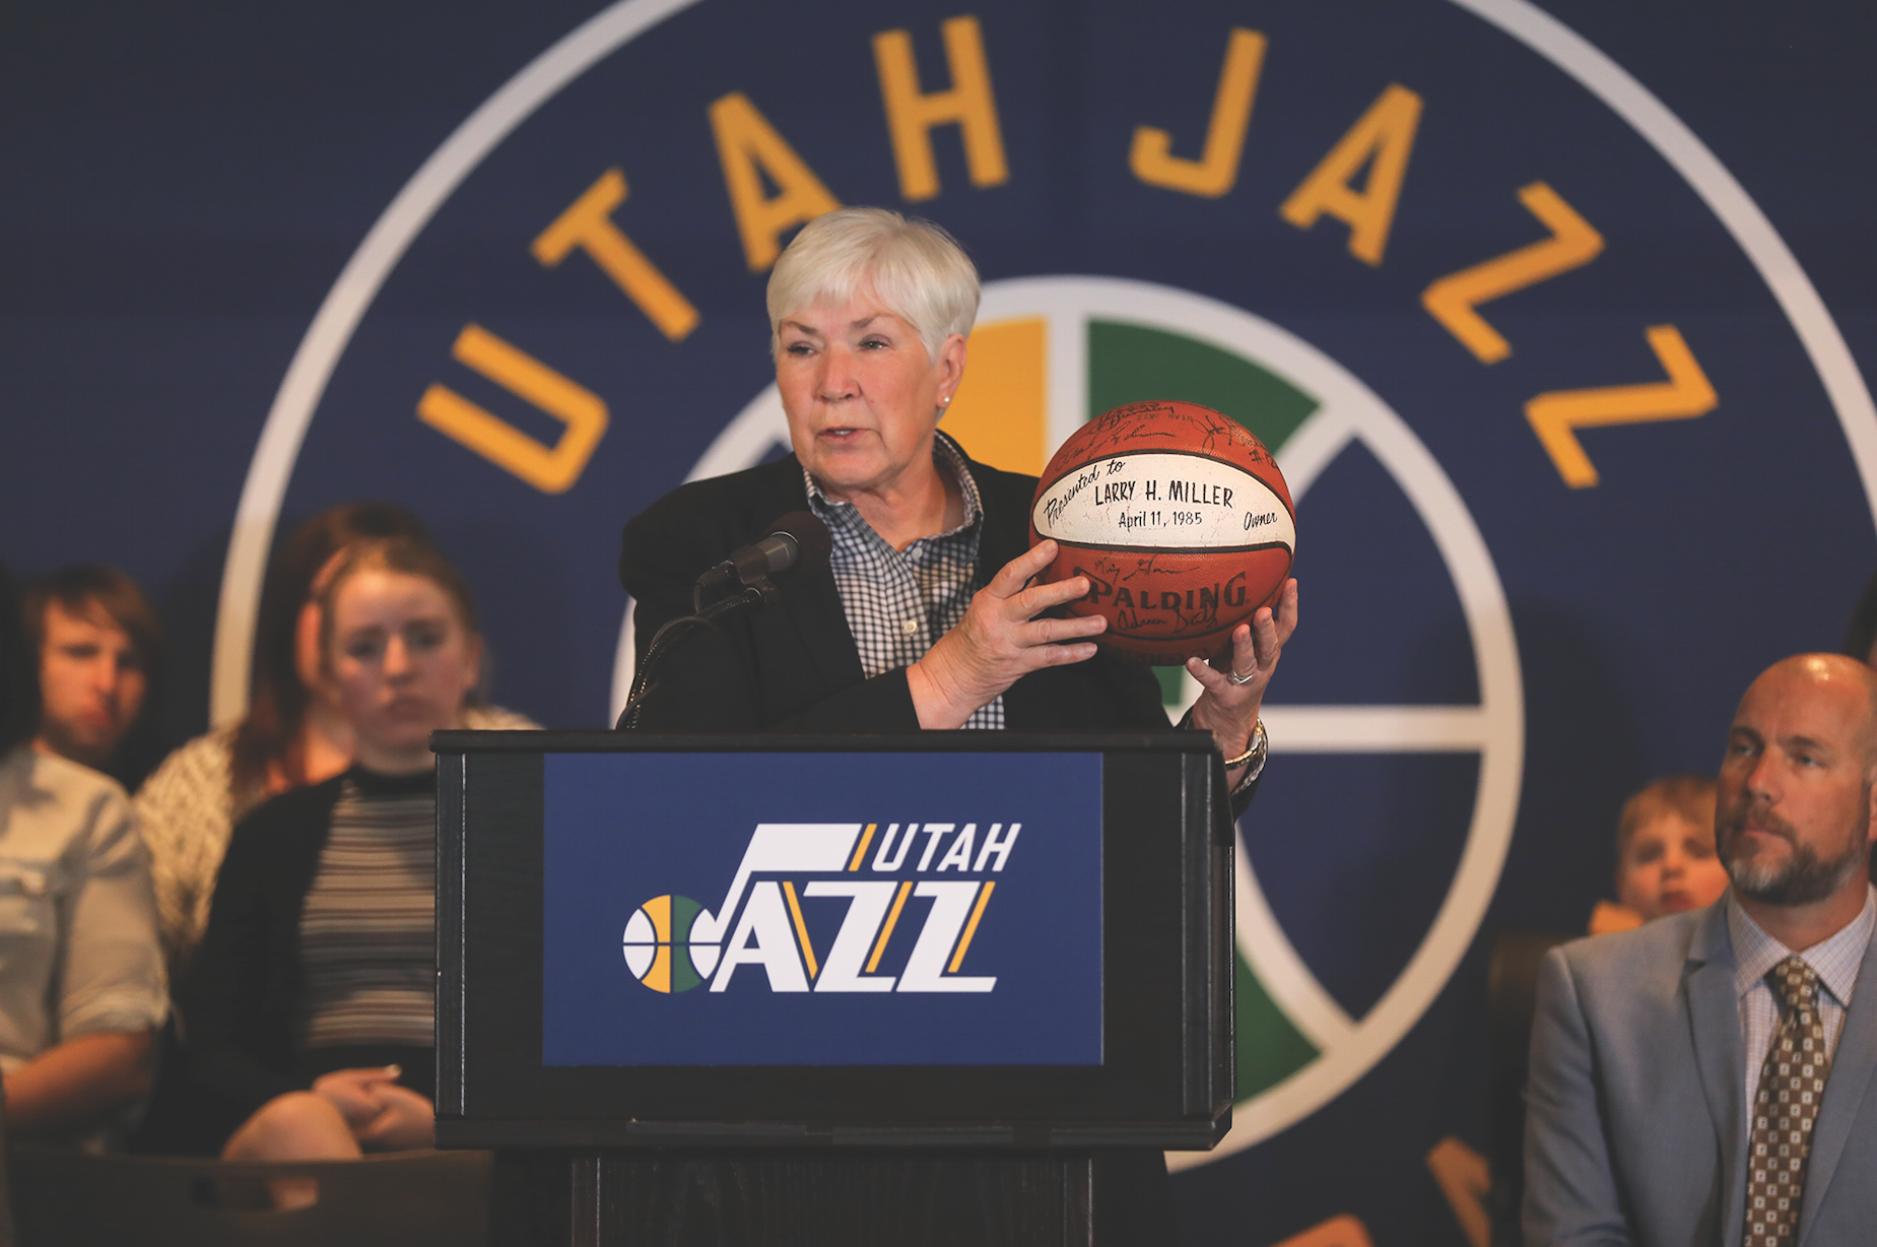 Intrepid - Utah Jazz Legacy Trust Case Study